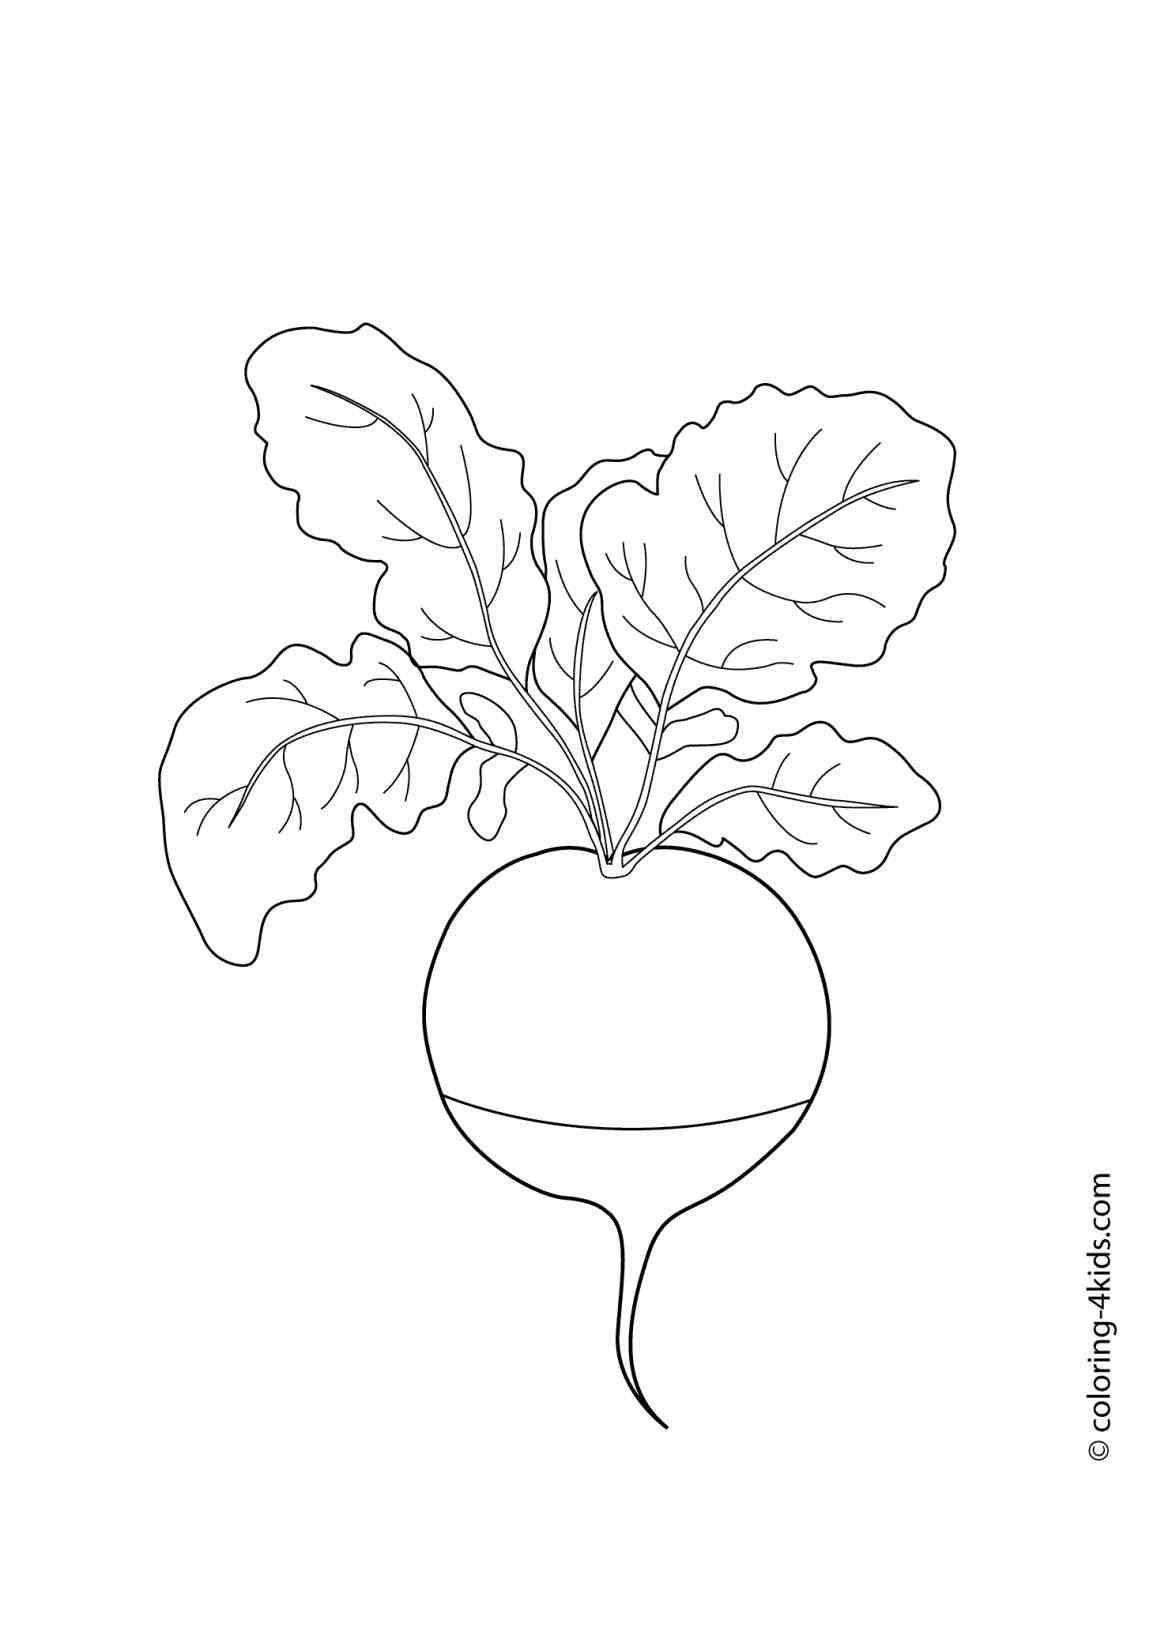 Sweet Potato Drawing At Getdrawings